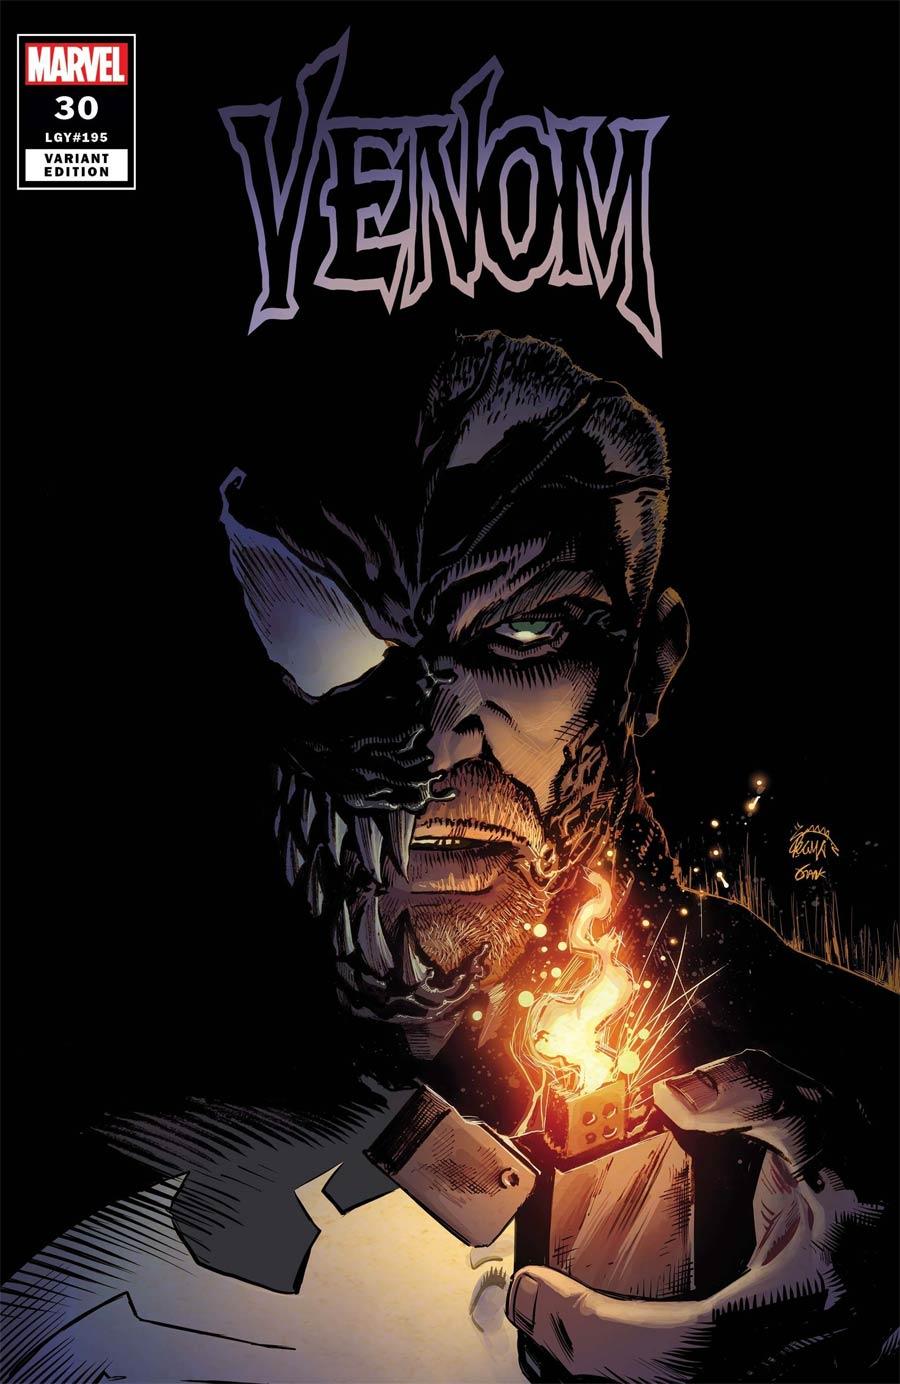 Venom Vol 4 #30 Cover B Variant Ryan Stegman Cover